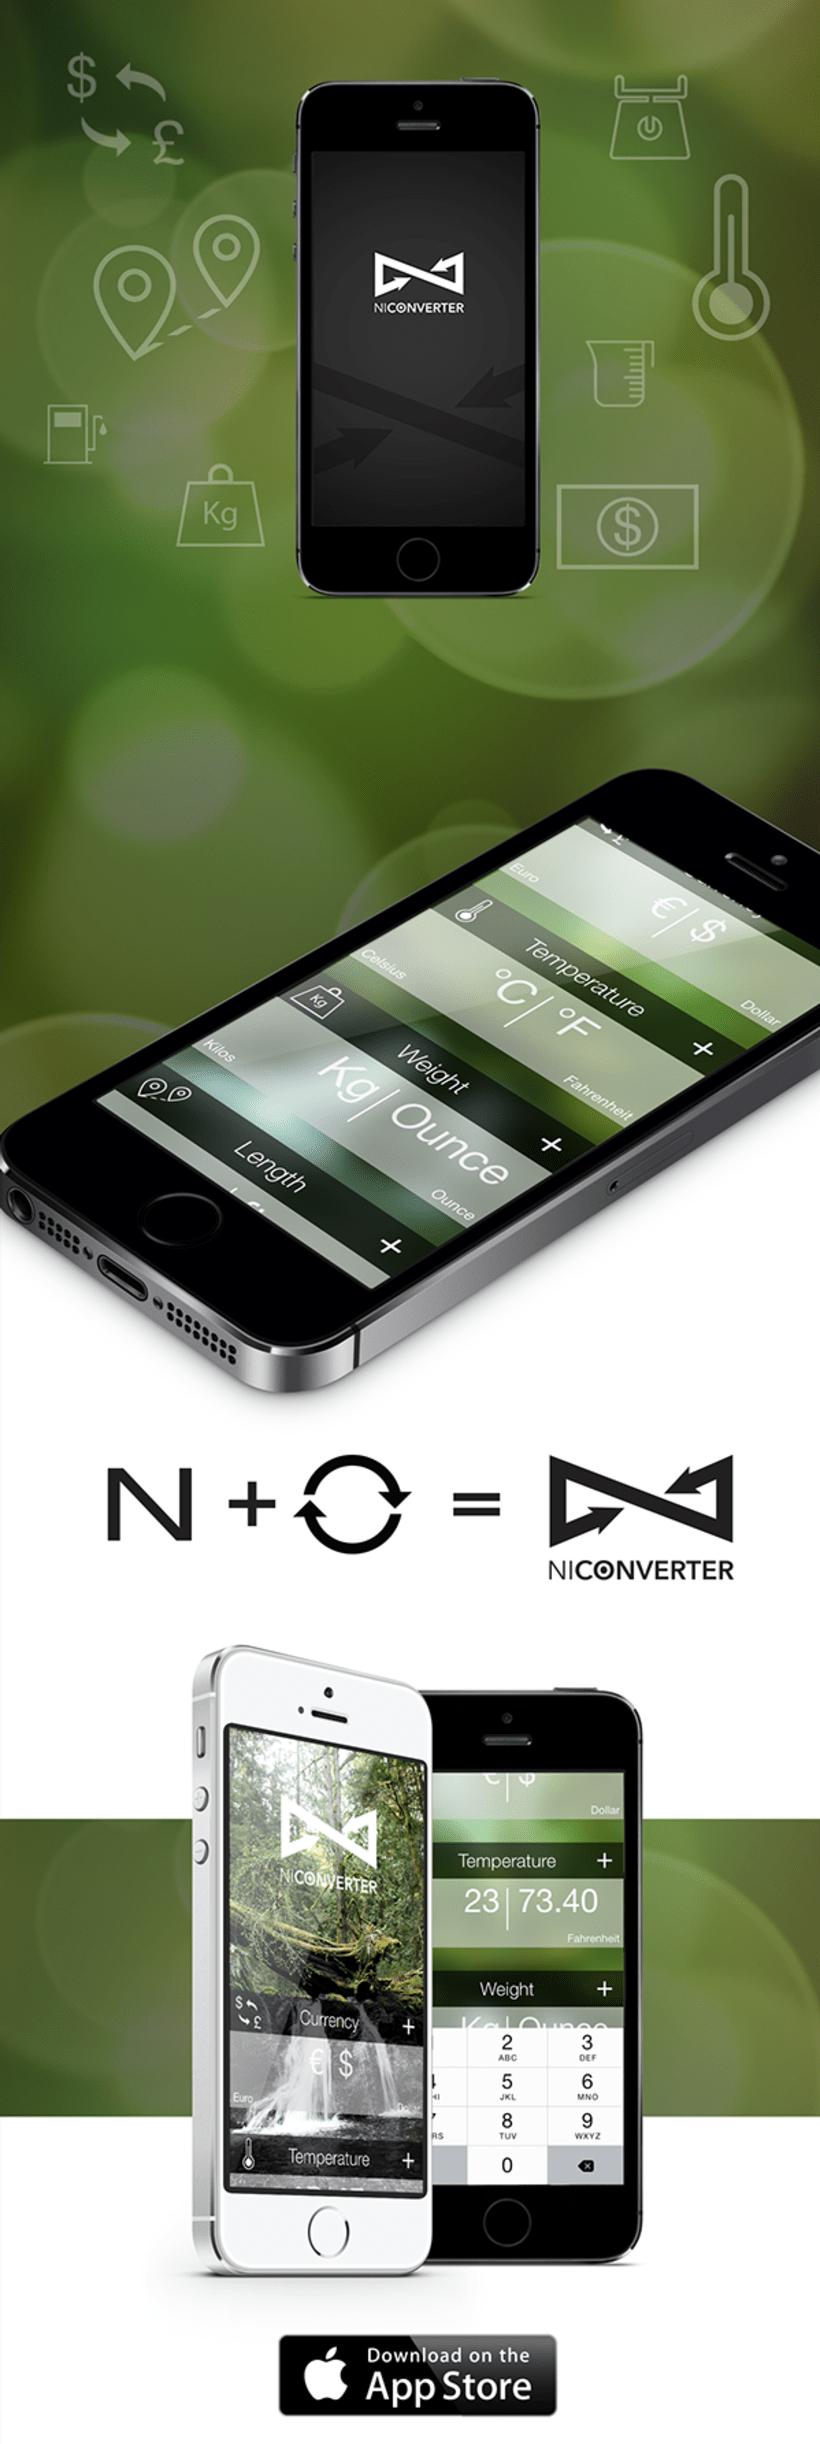 Niconverter App -1